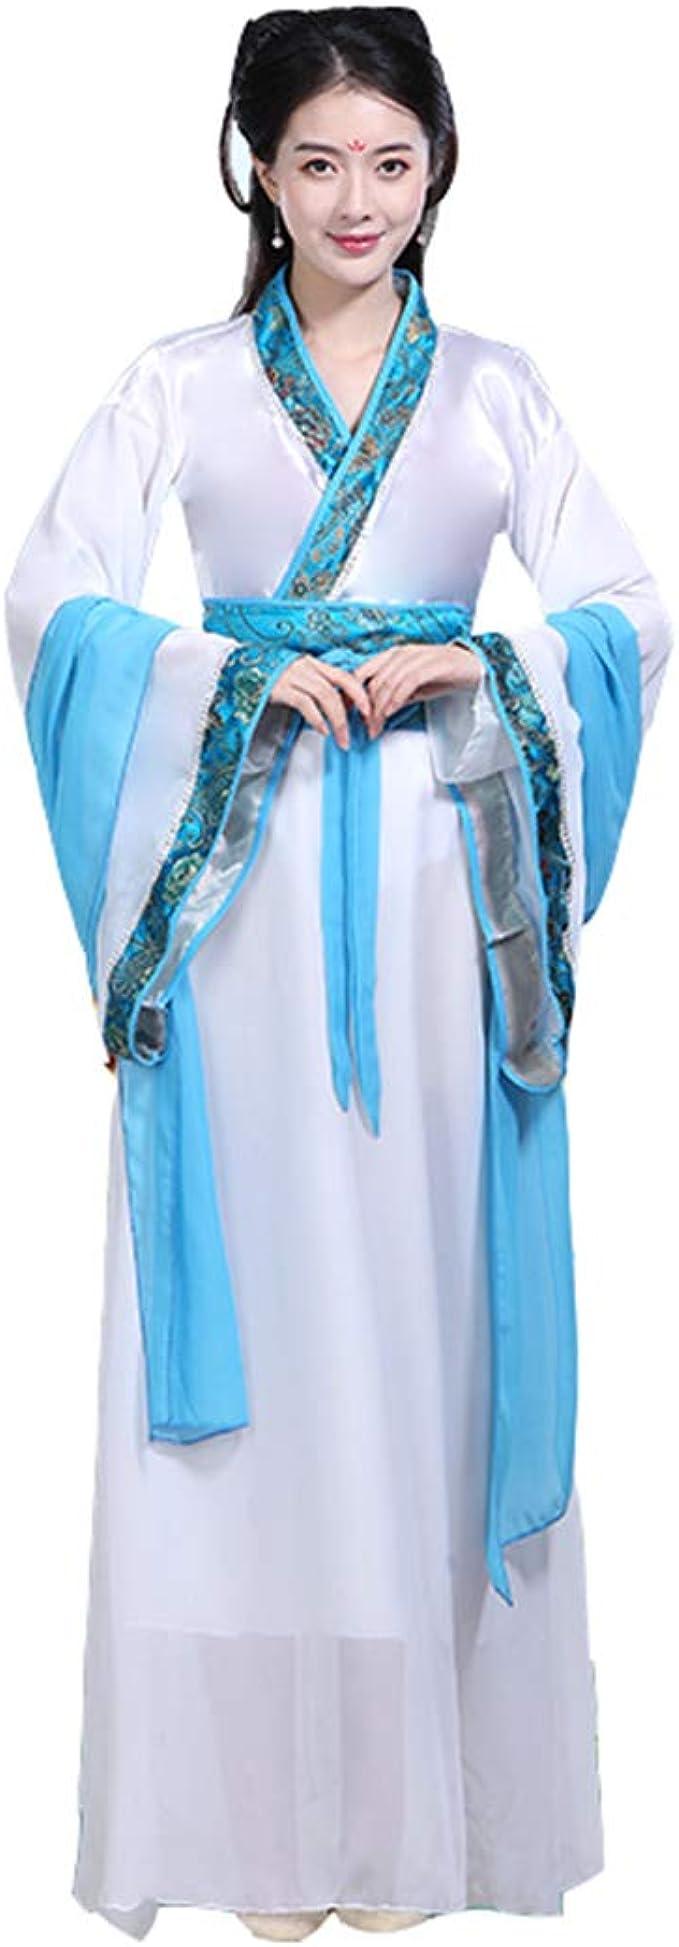 Amazon.com: ez-sofei Mujer Tradicional De La Antigua China ...